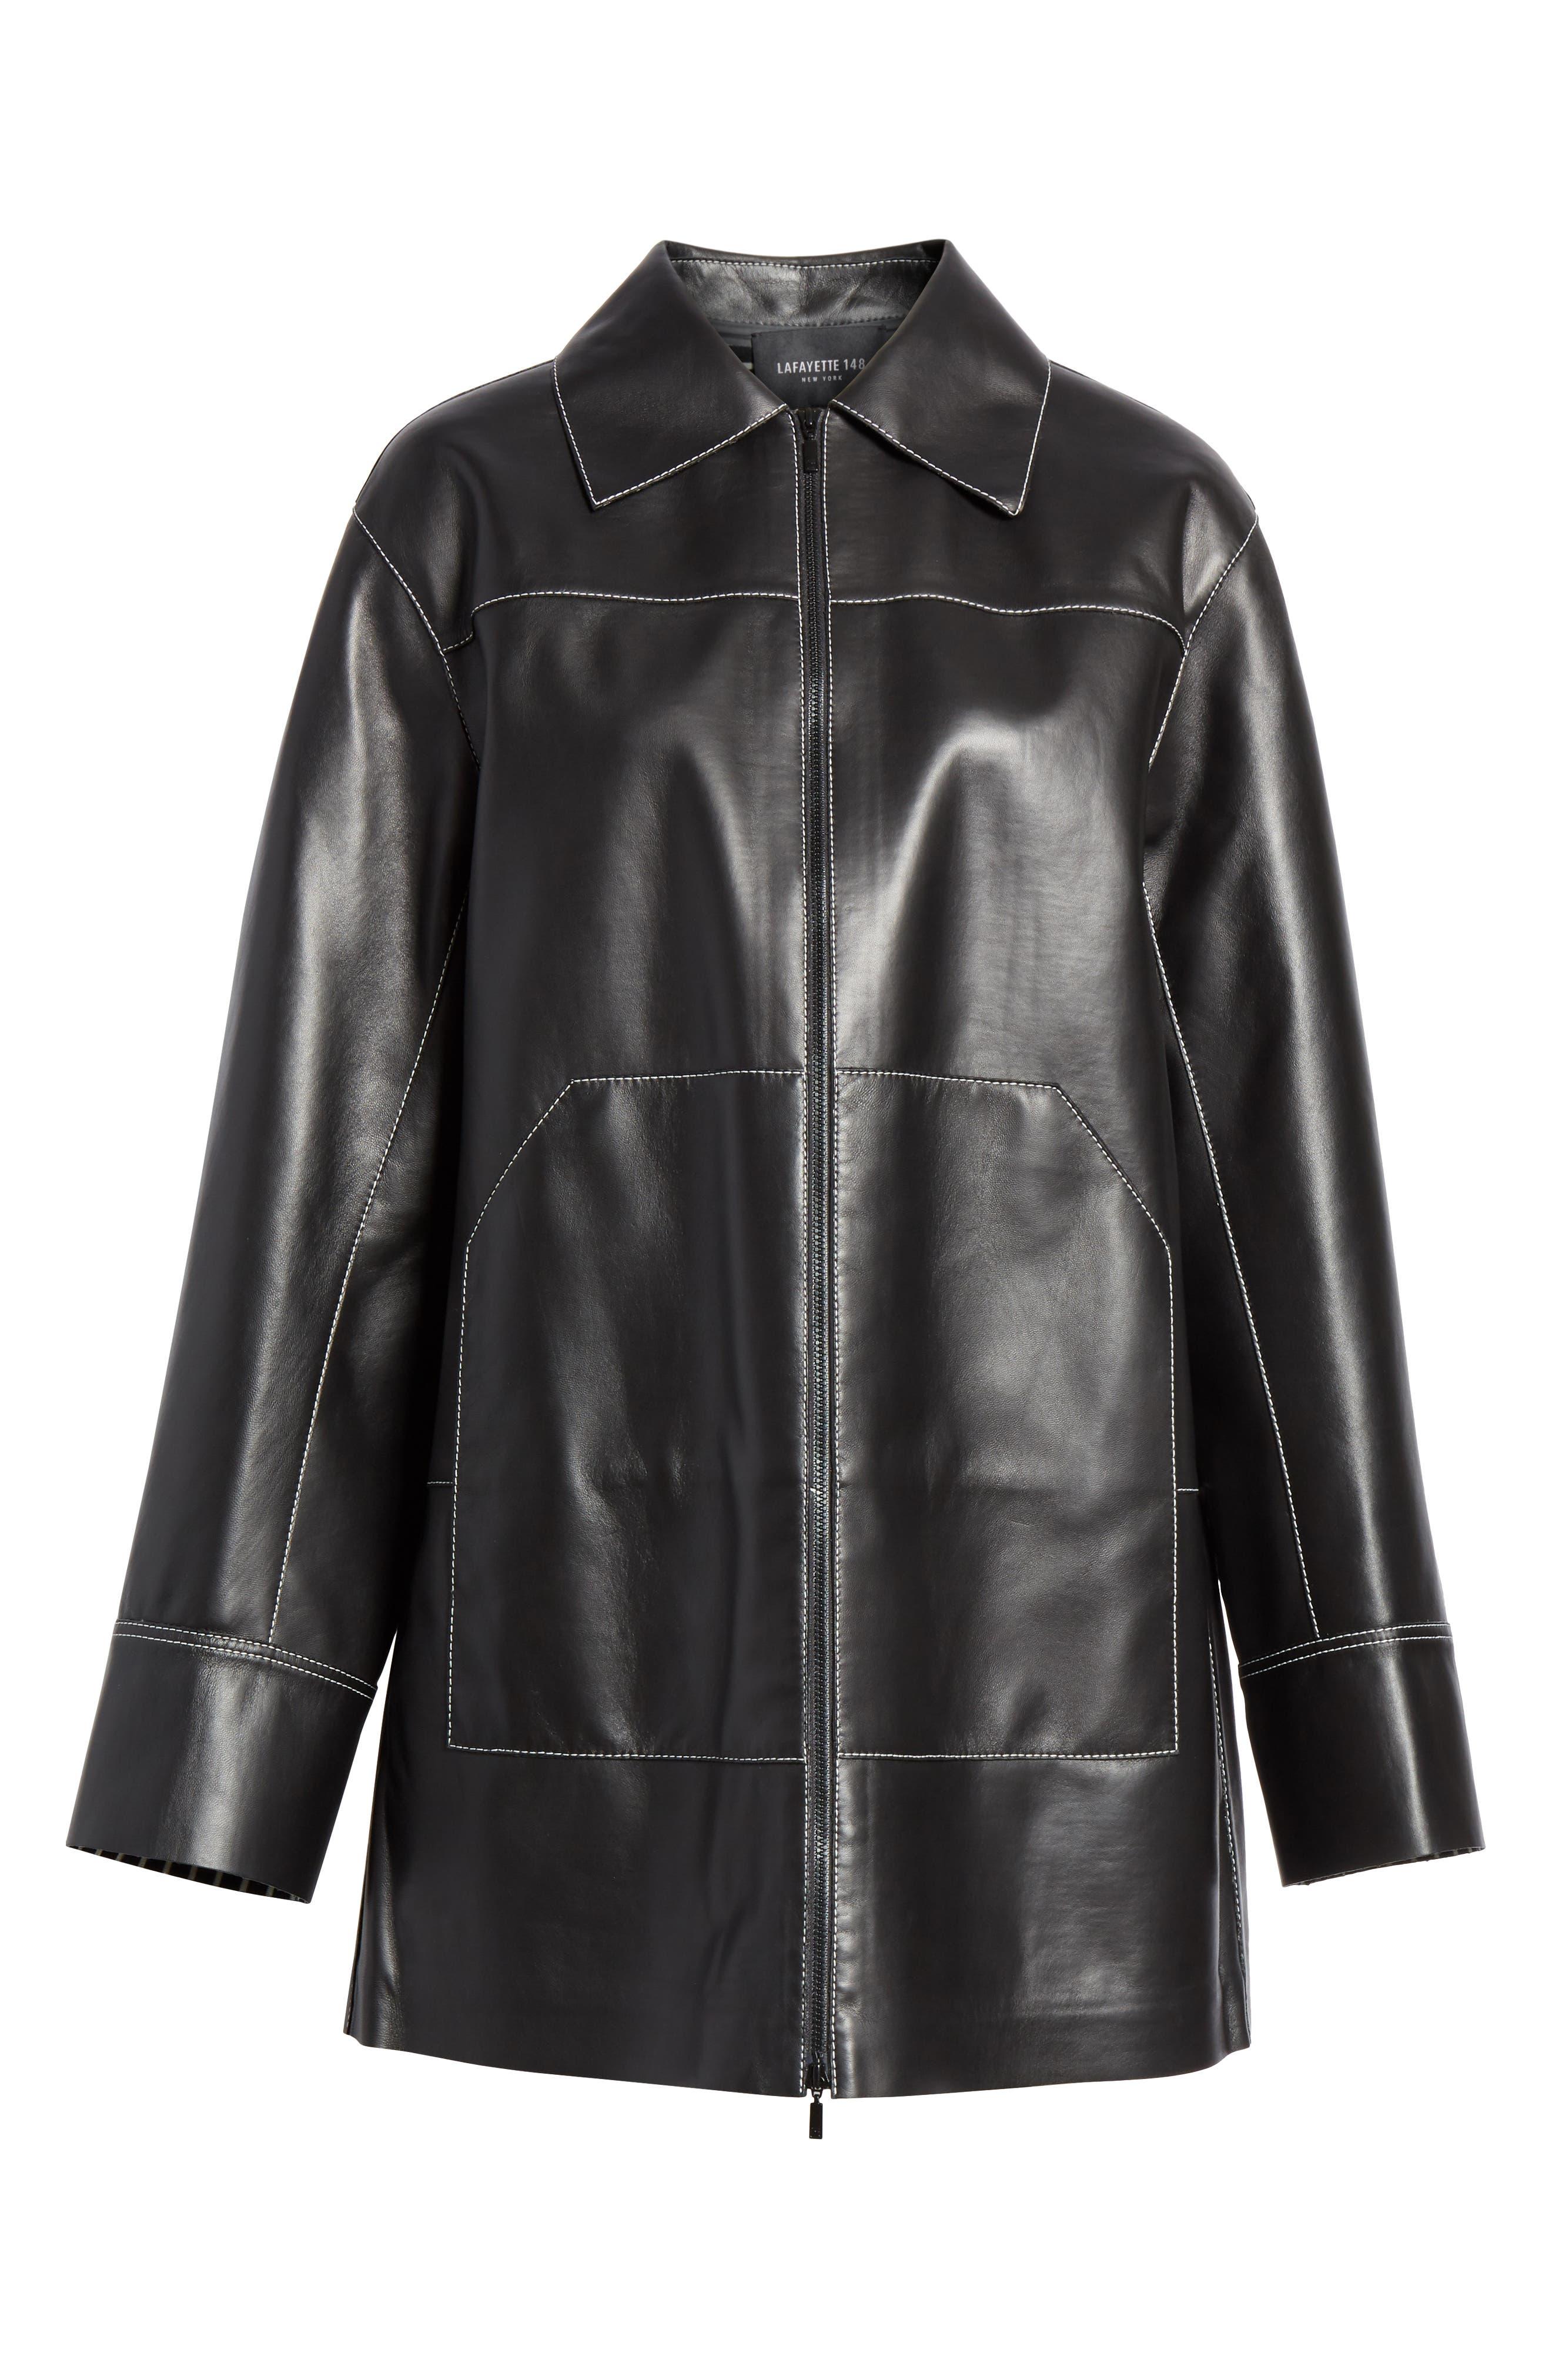 Christopher Leather Jacket,                             Alternate thumbnail 6, color,                             BLACK